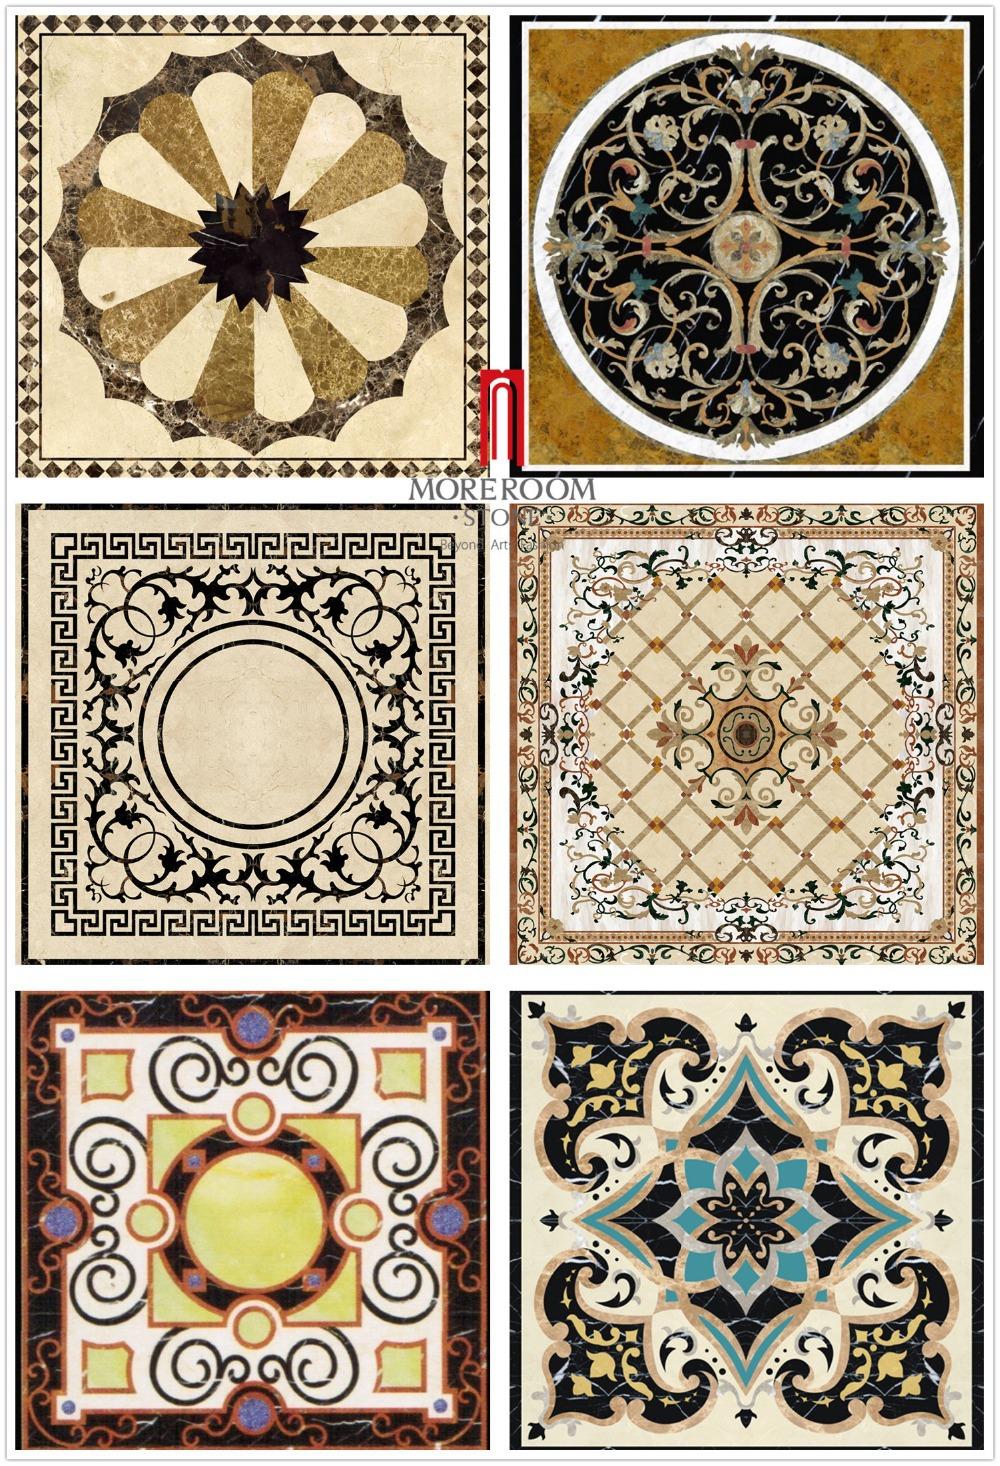 Moreroom-stone-oval-waterjet-marble-medallion-logo-mix-1.jpg